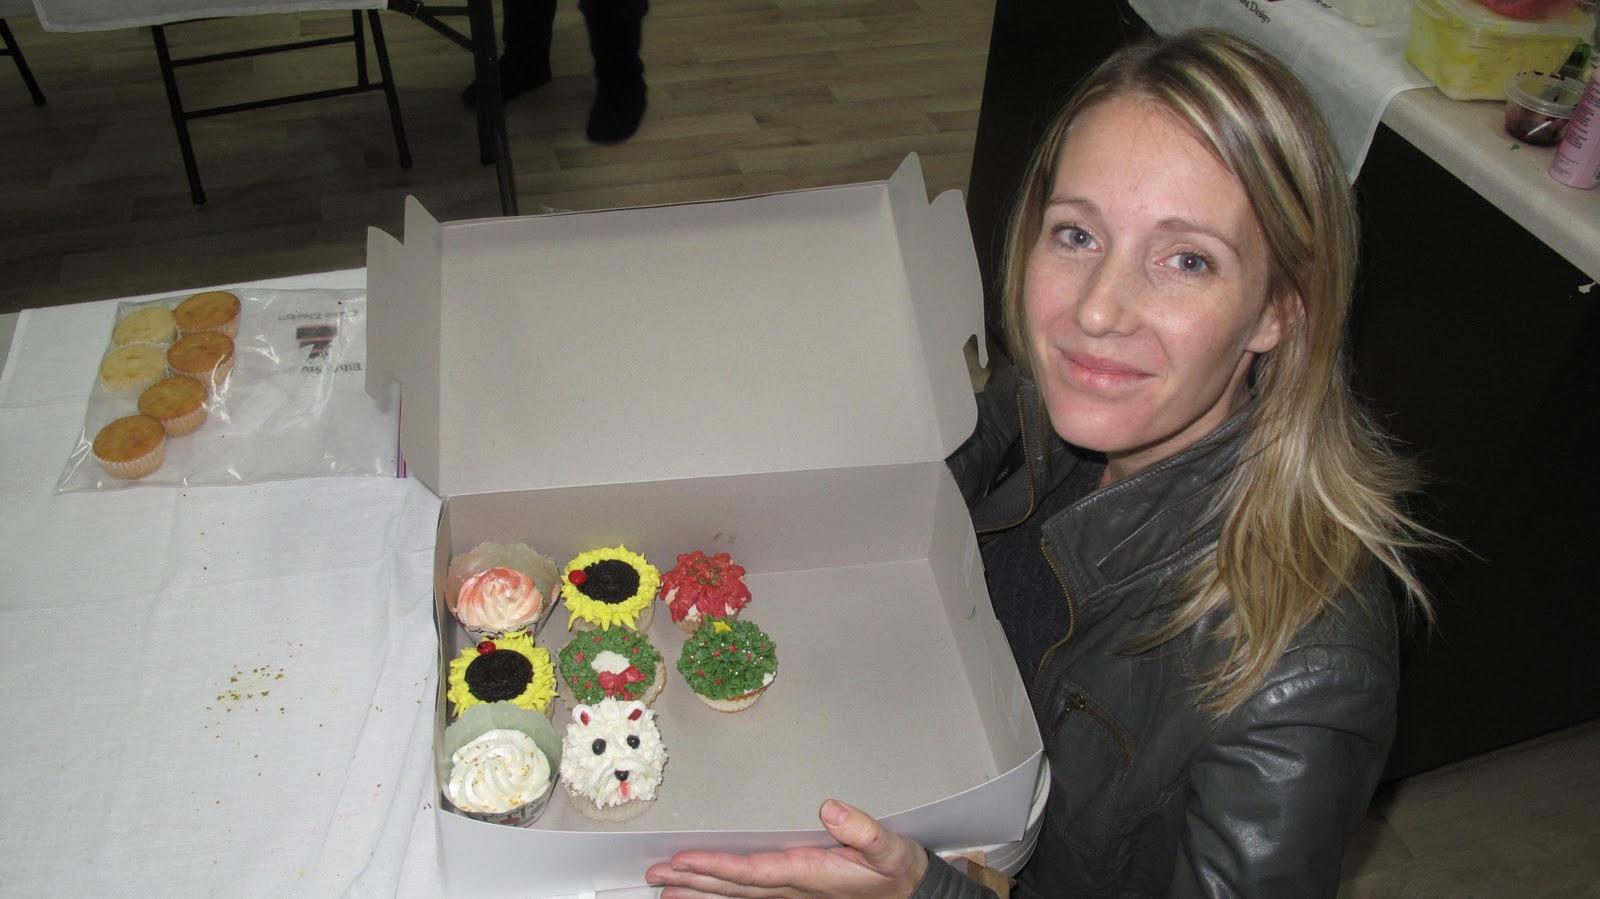 Elly S Studio Cake Design Chilliwack : Elly s Studio of Cake Design: cupcake art class Dec. 2010